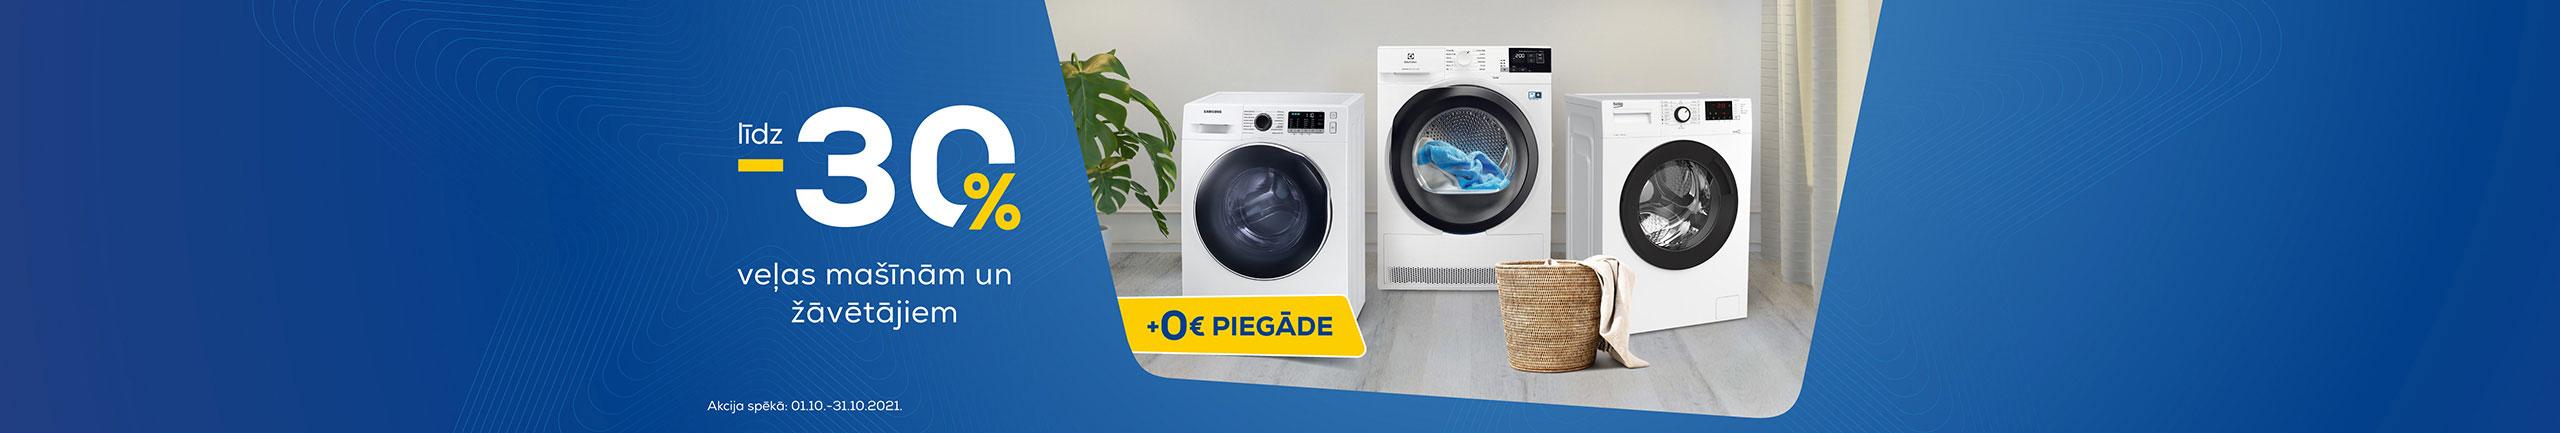 FPS Wash Dry